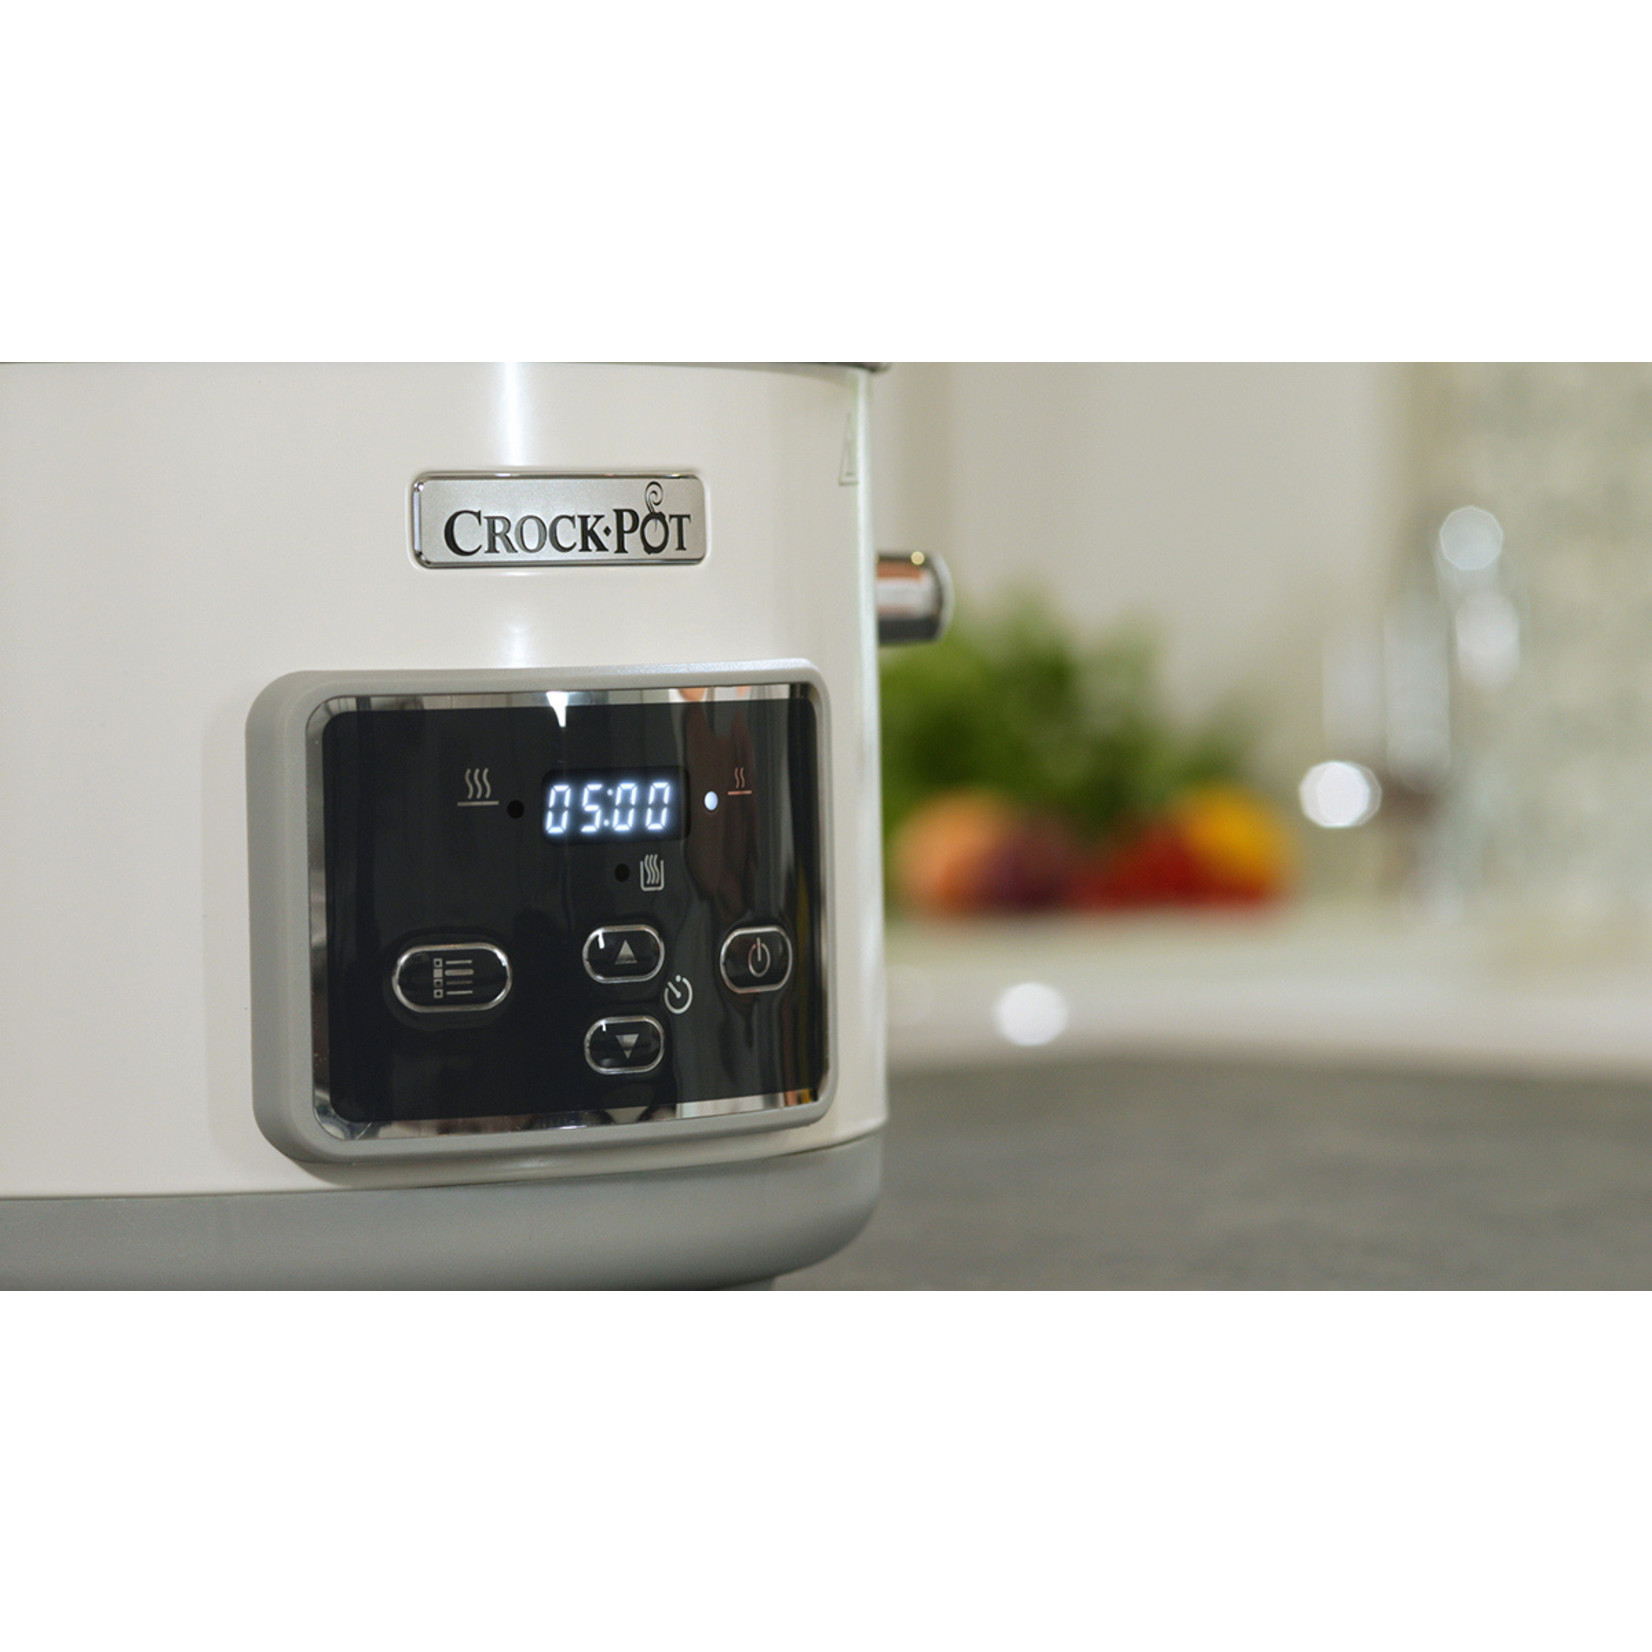 Crock-Pot Crock-Pot DuraCeramic slowcooker Saute 5L wit met klapdeksel